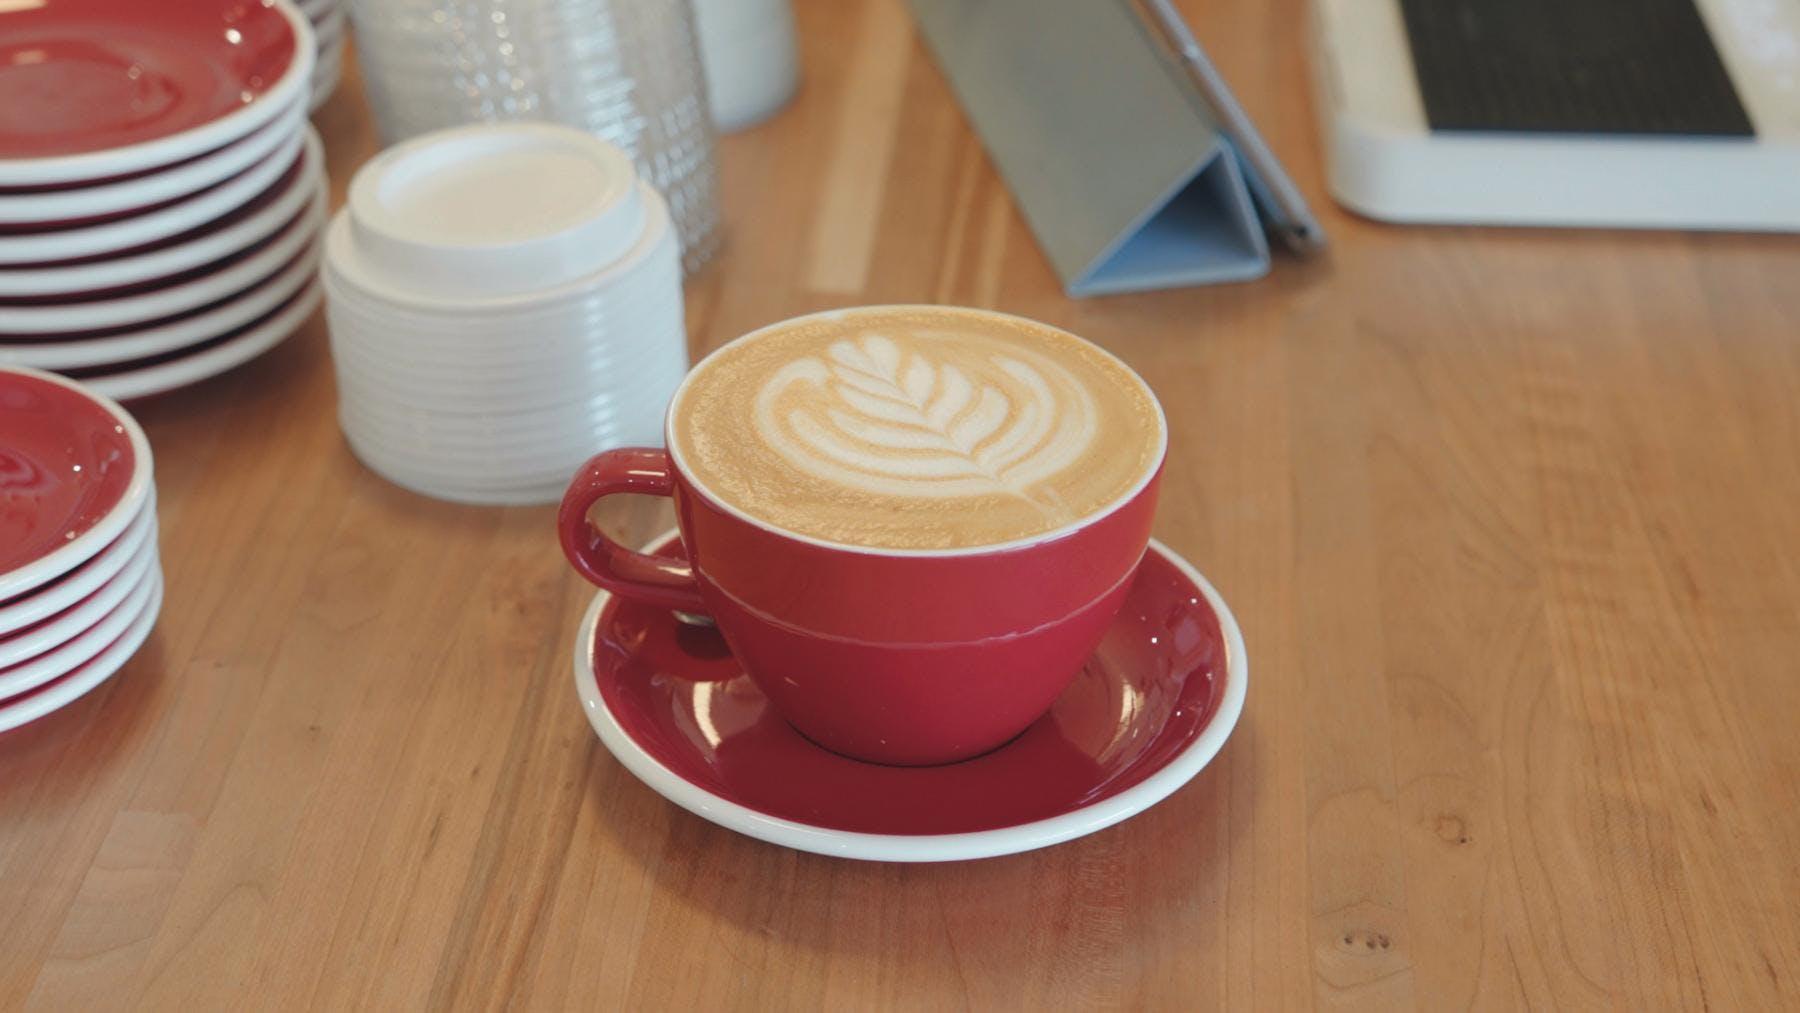 Monomyth Coffee cover image